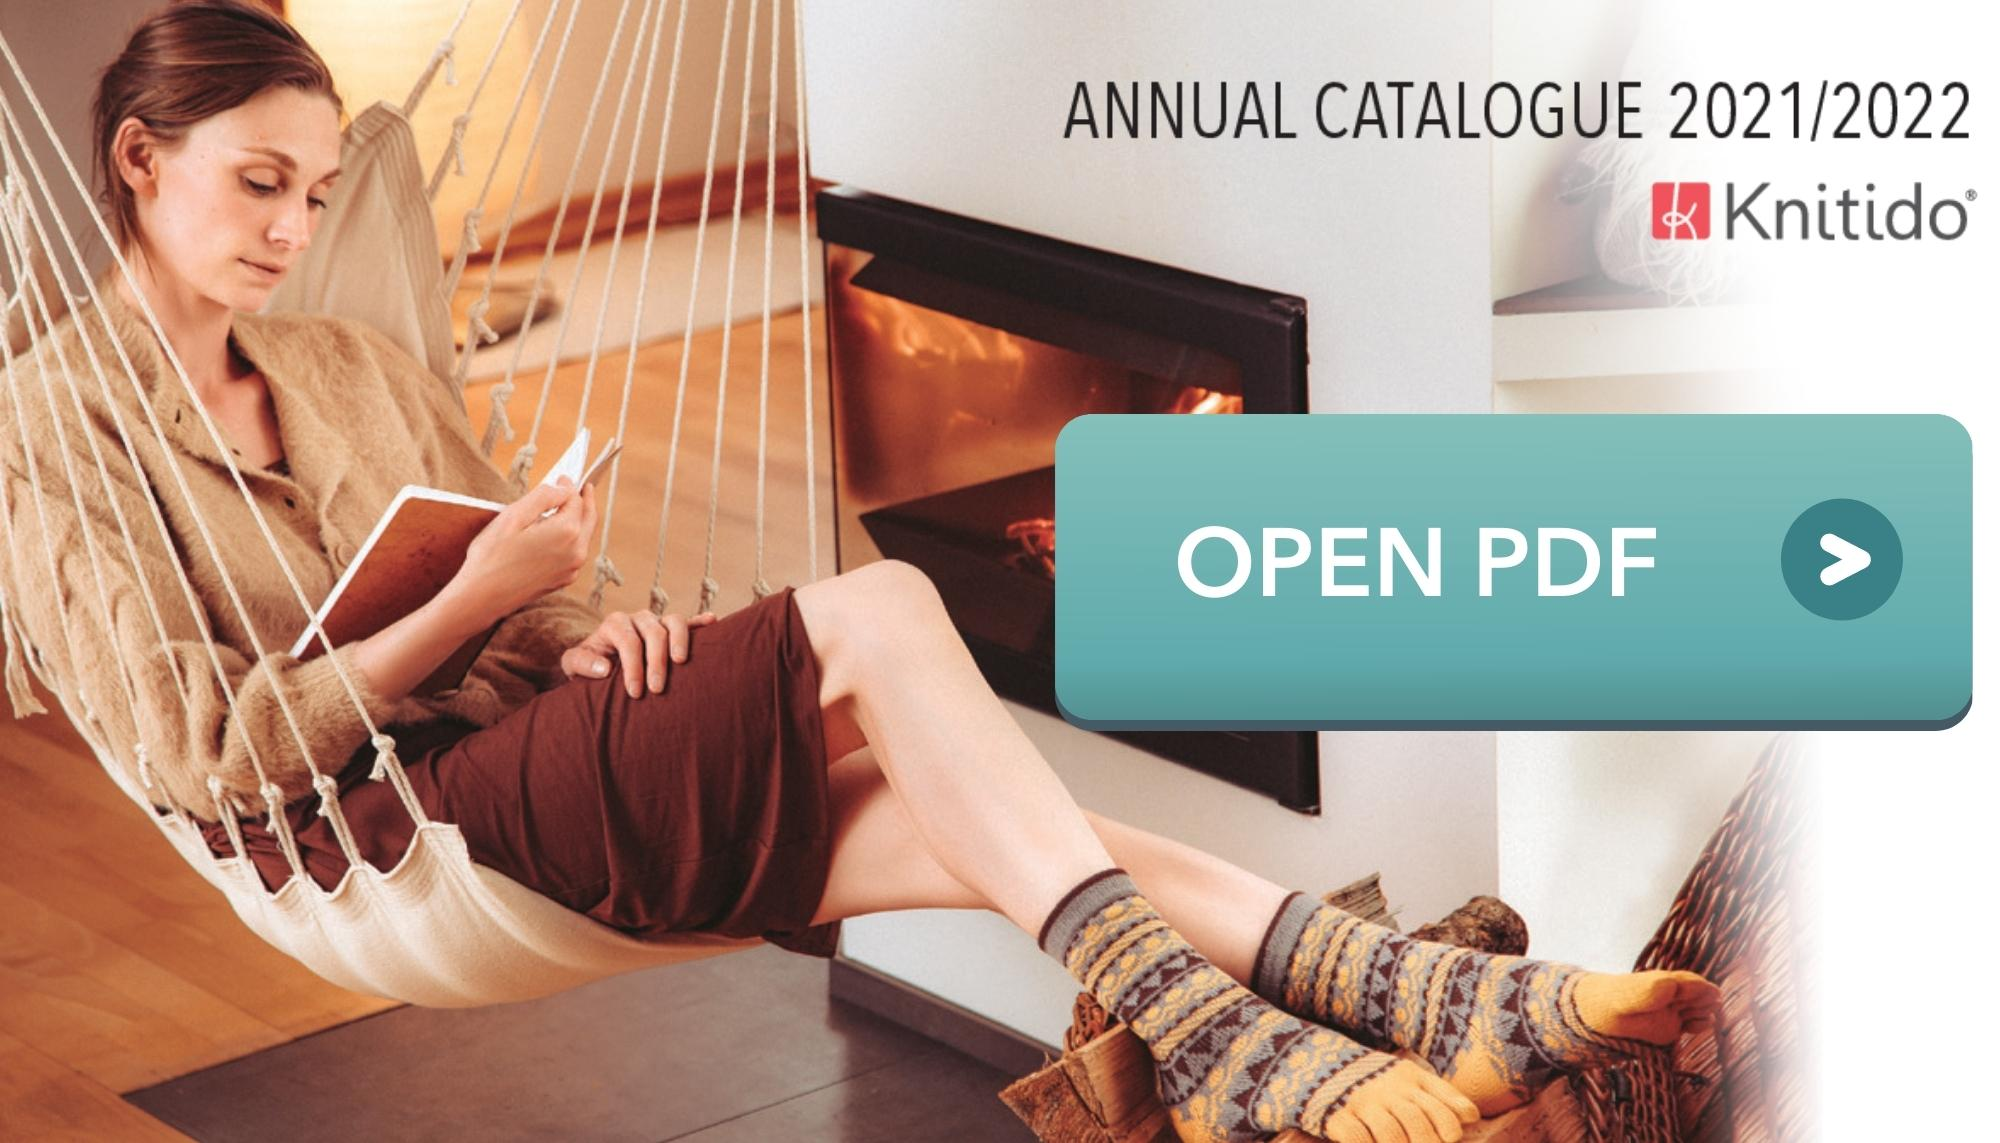 Knitido annual catalogue preview